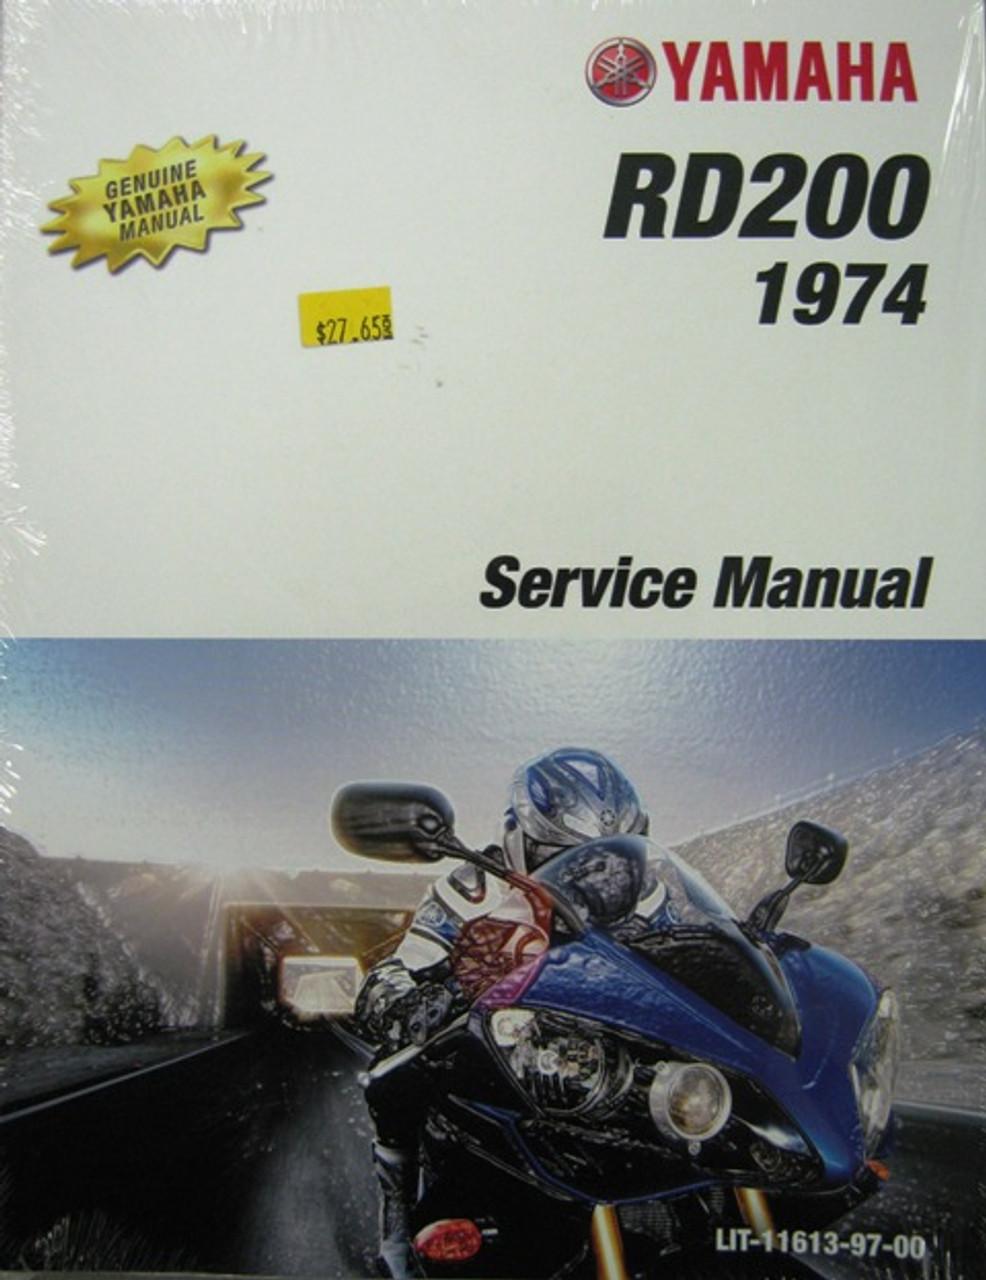 Genuine Yamaha RD200 Service Manual